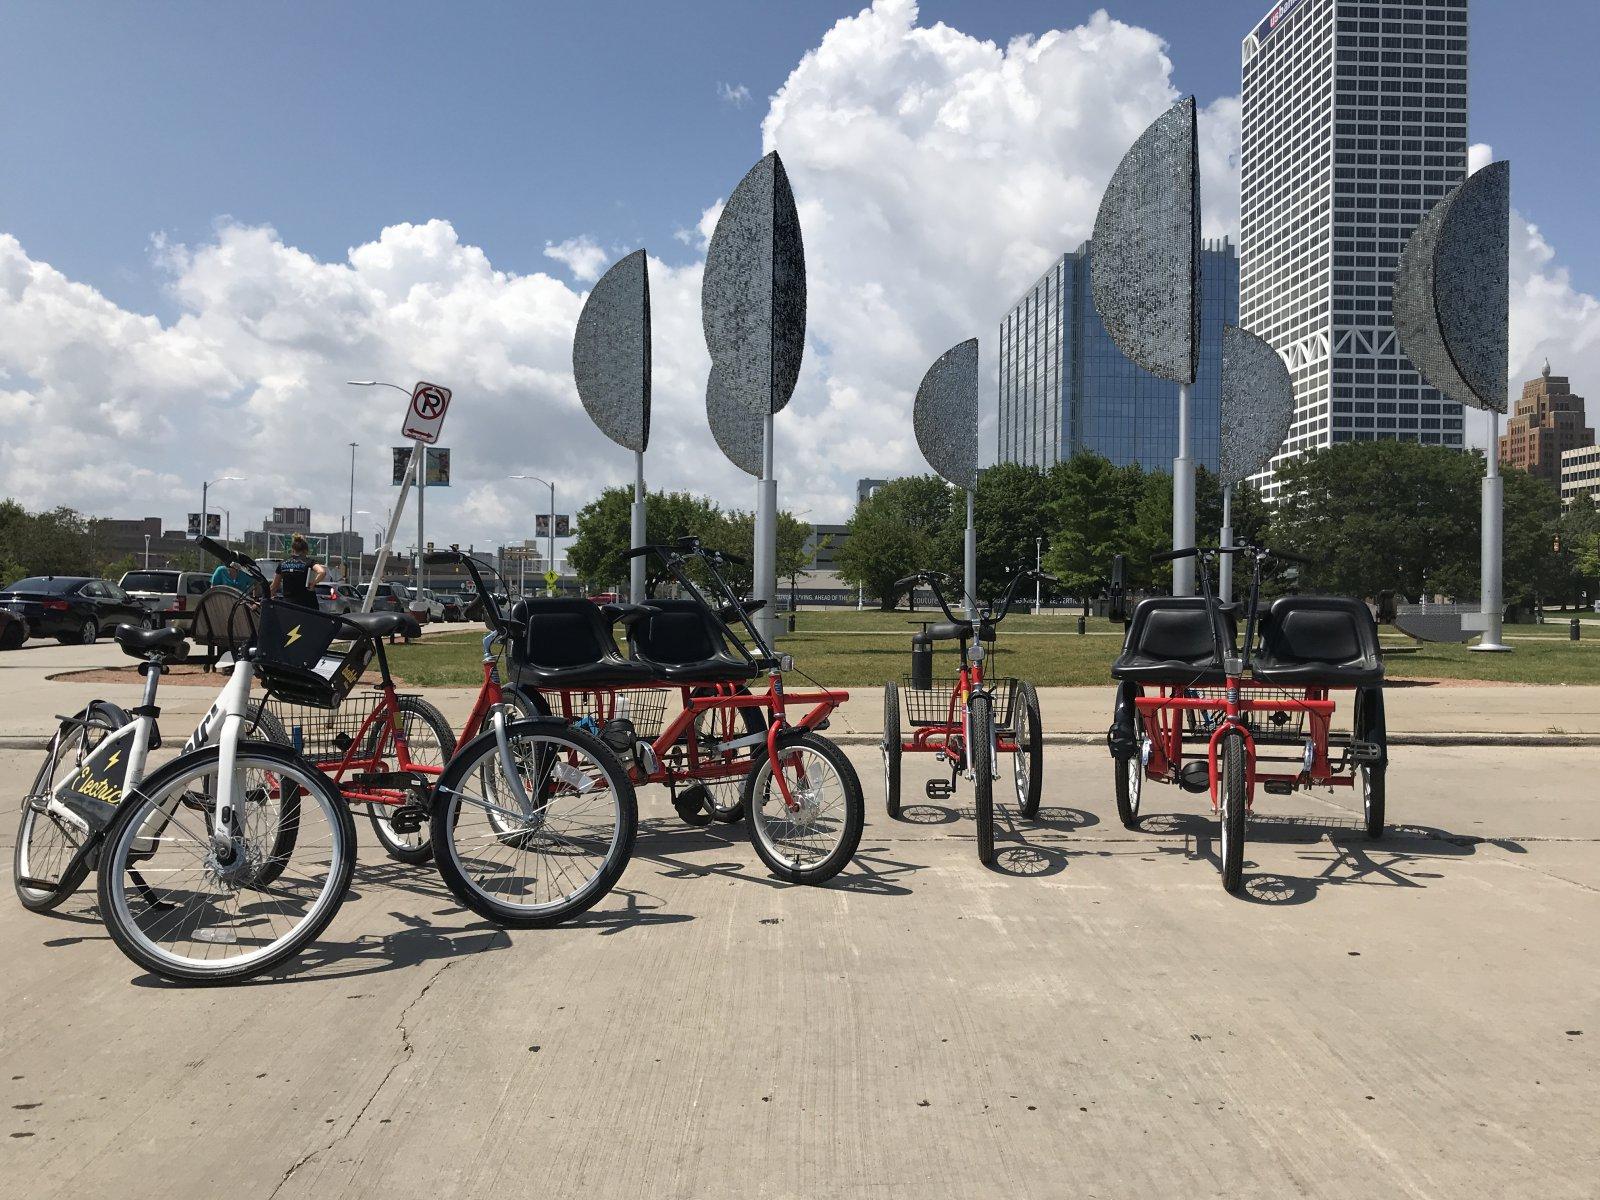 New adaptive bikes